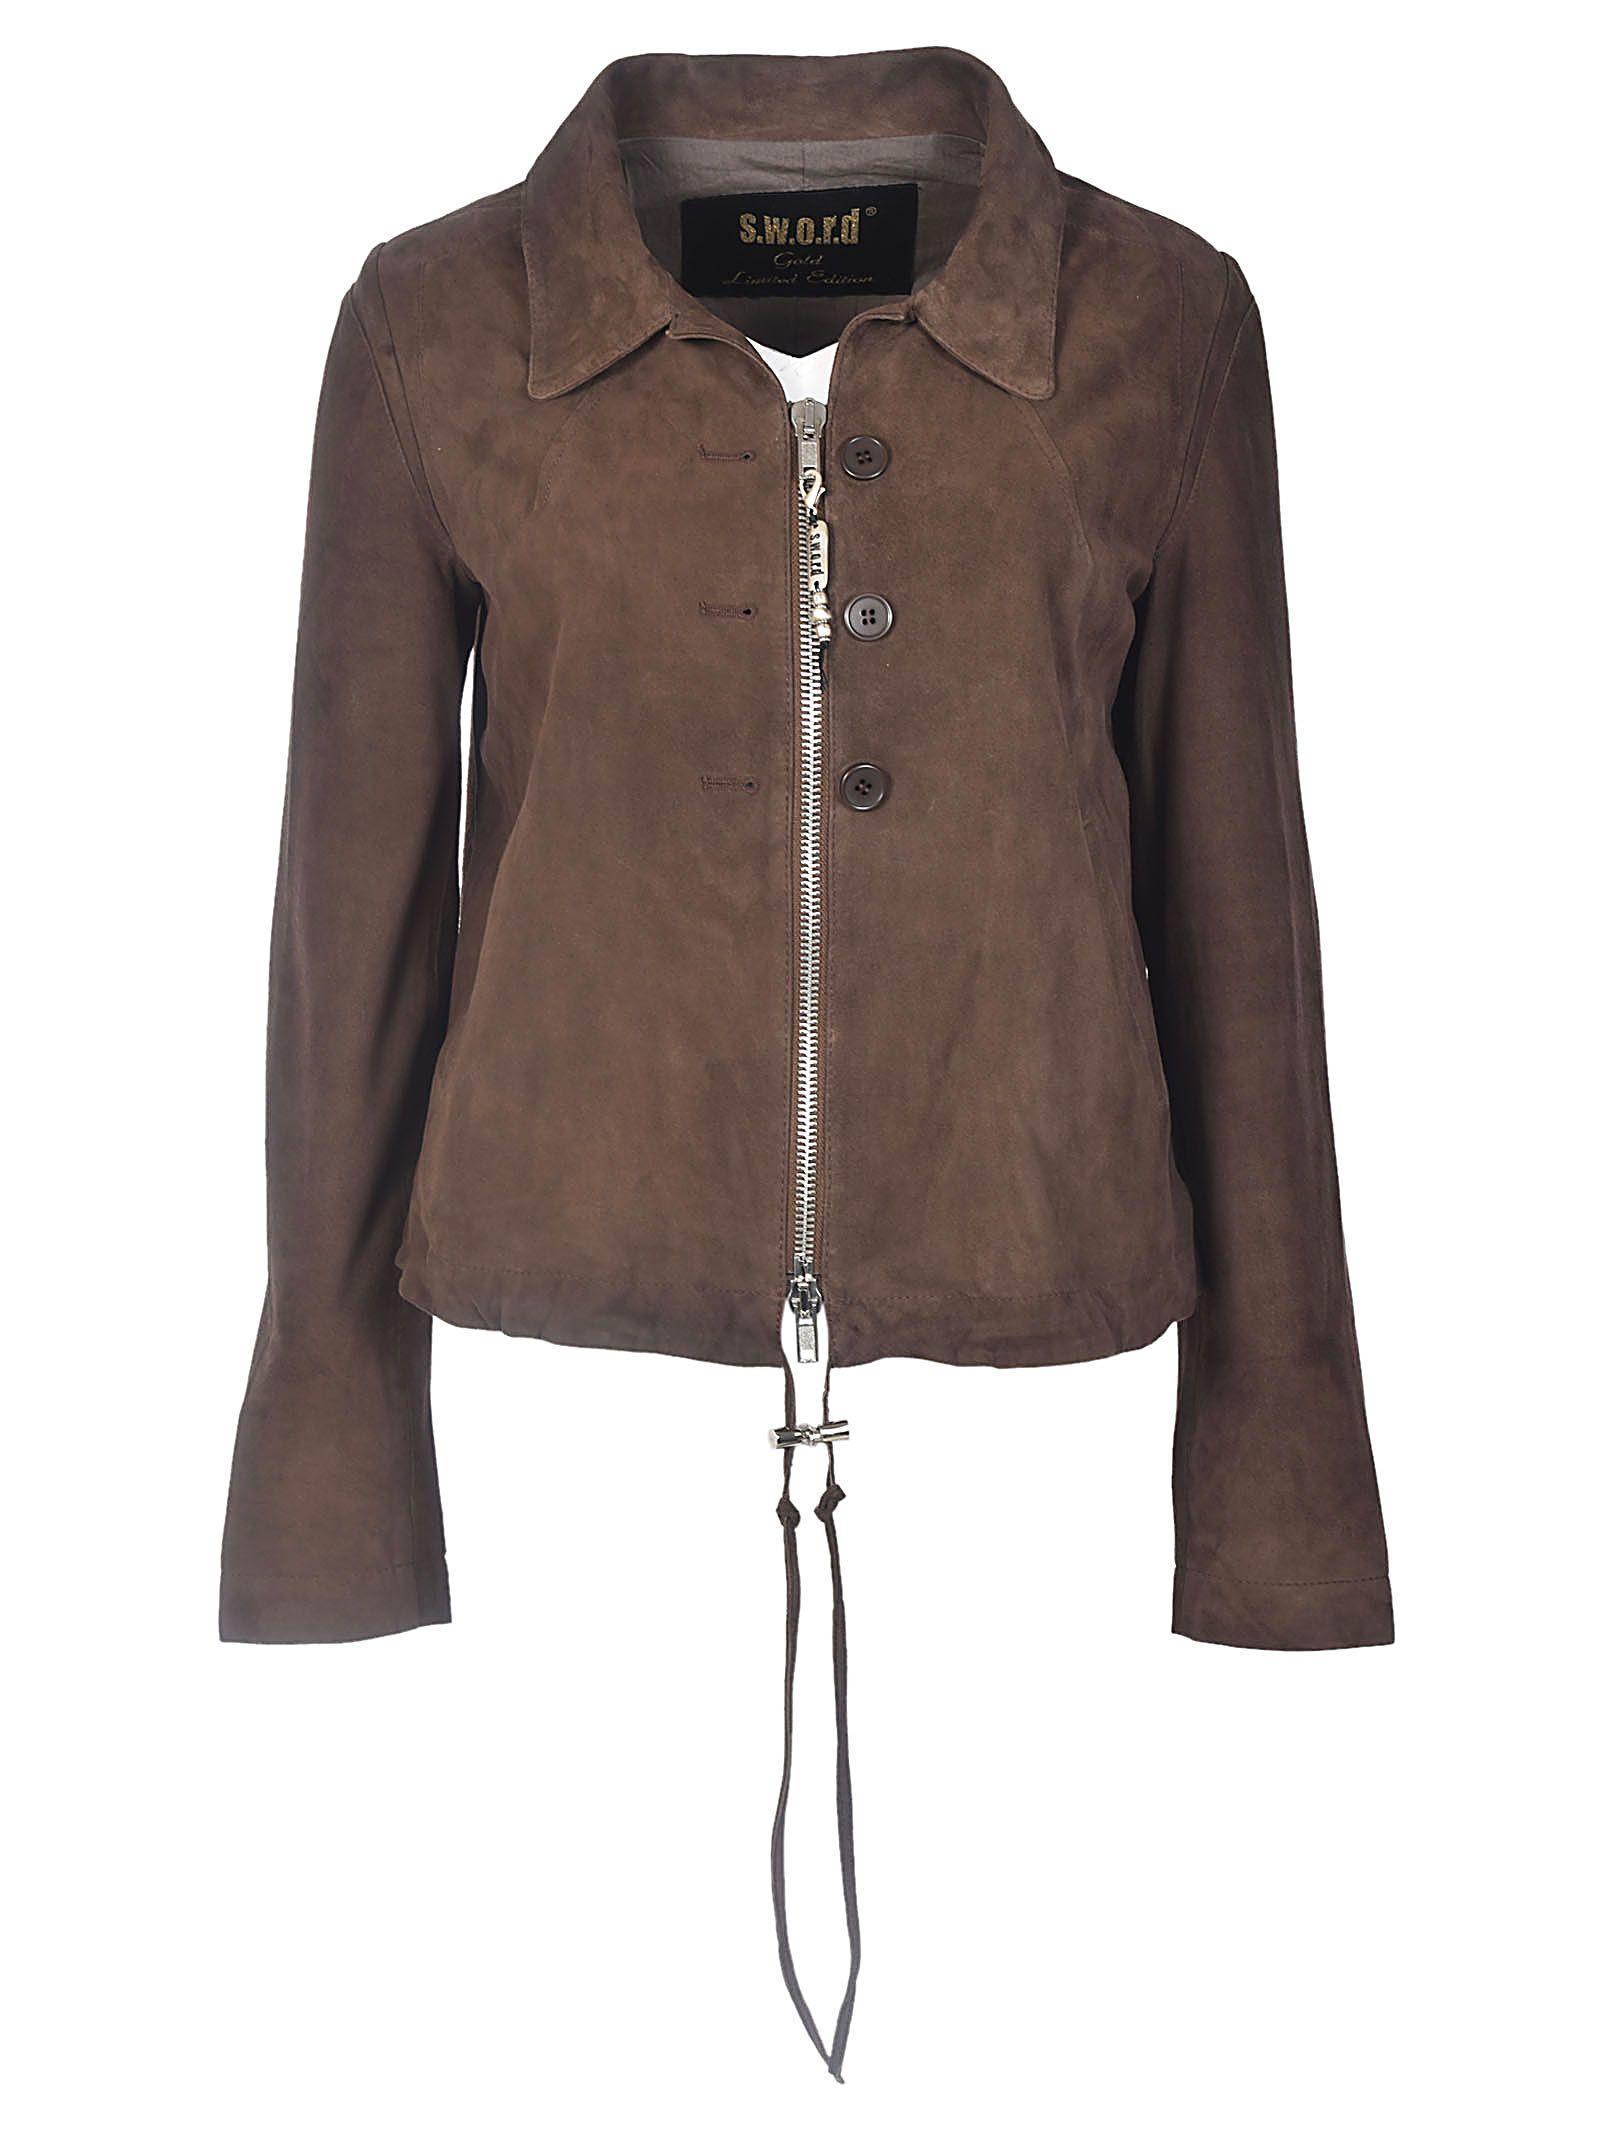 S.w.o.r.d Button Detail Jacket